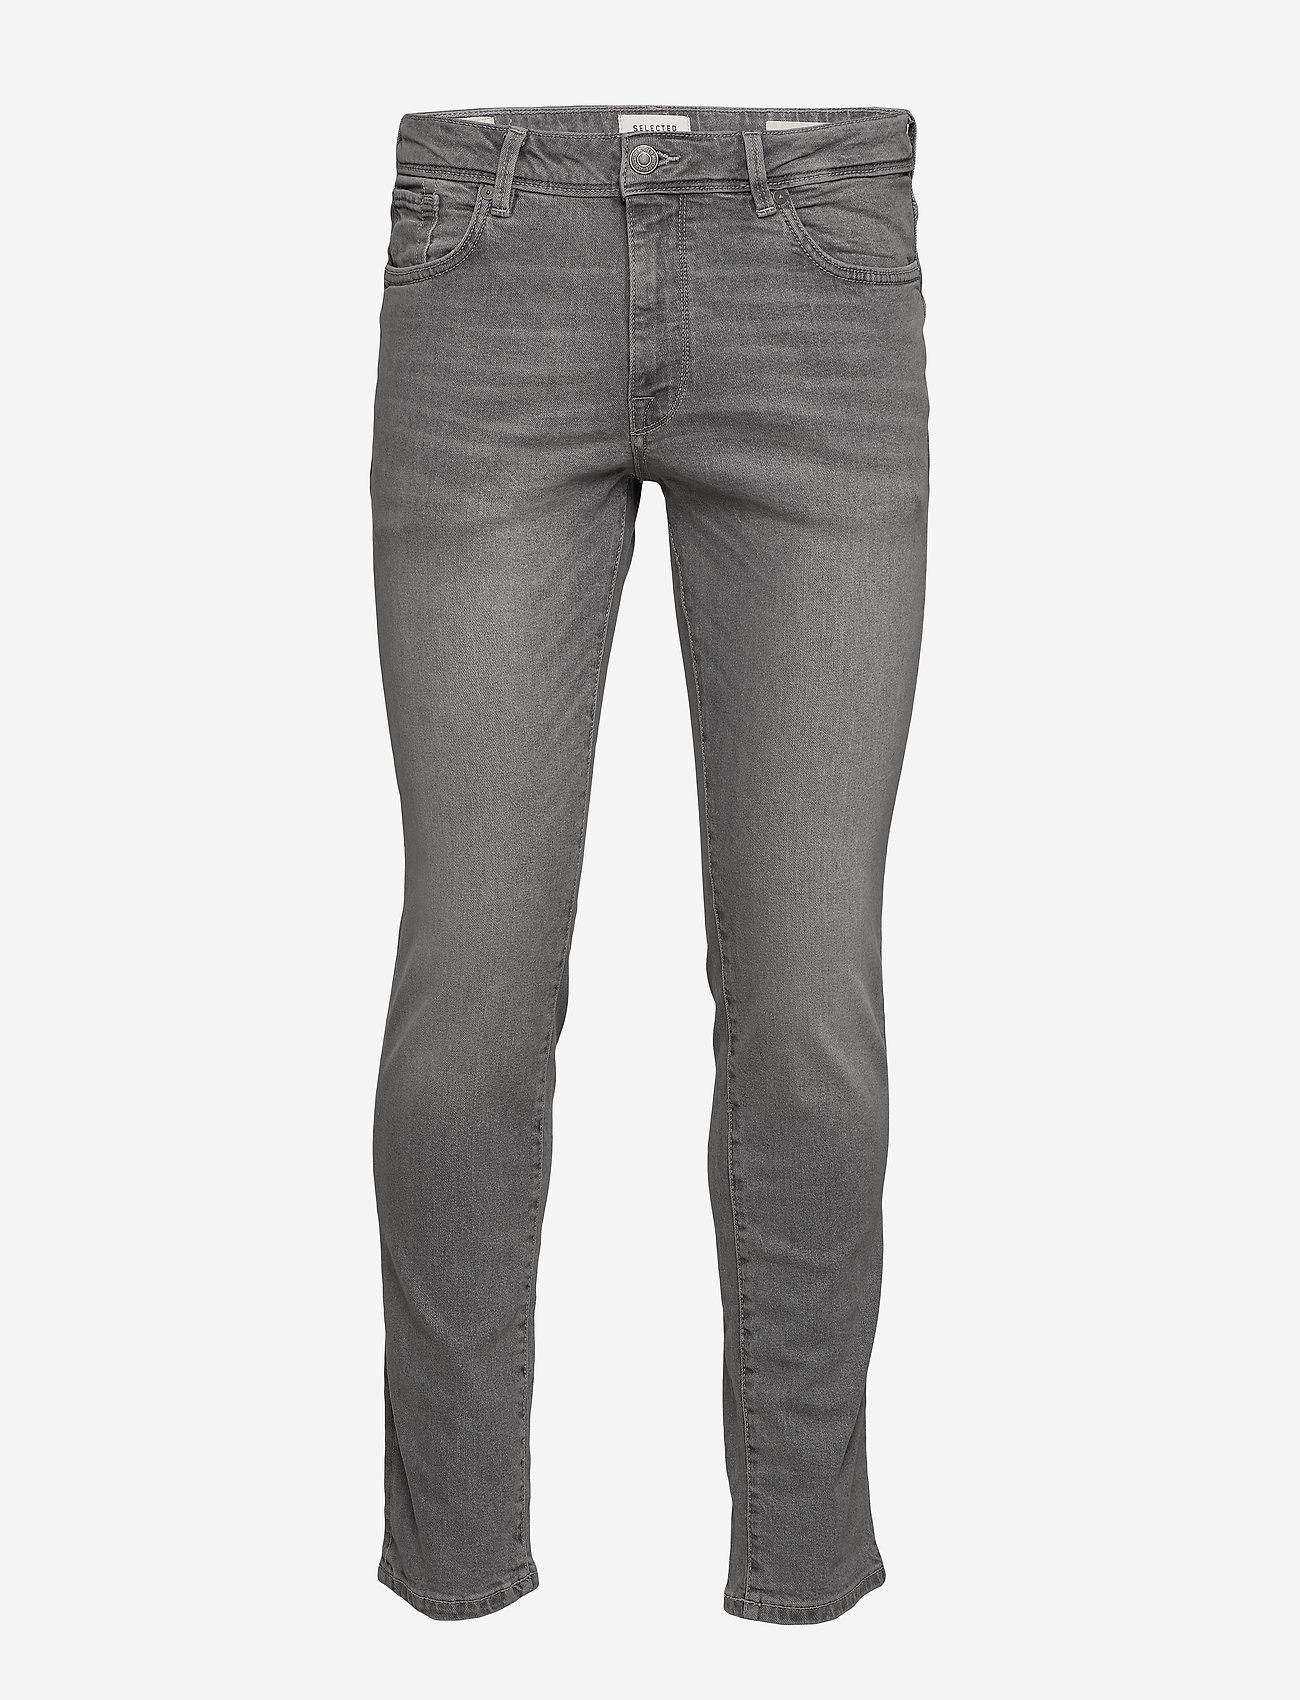 Selected Homme - SLHSLIM-LEON 3021 L.GREY ST JEANS W NOOS - slim jeans - light grey denim